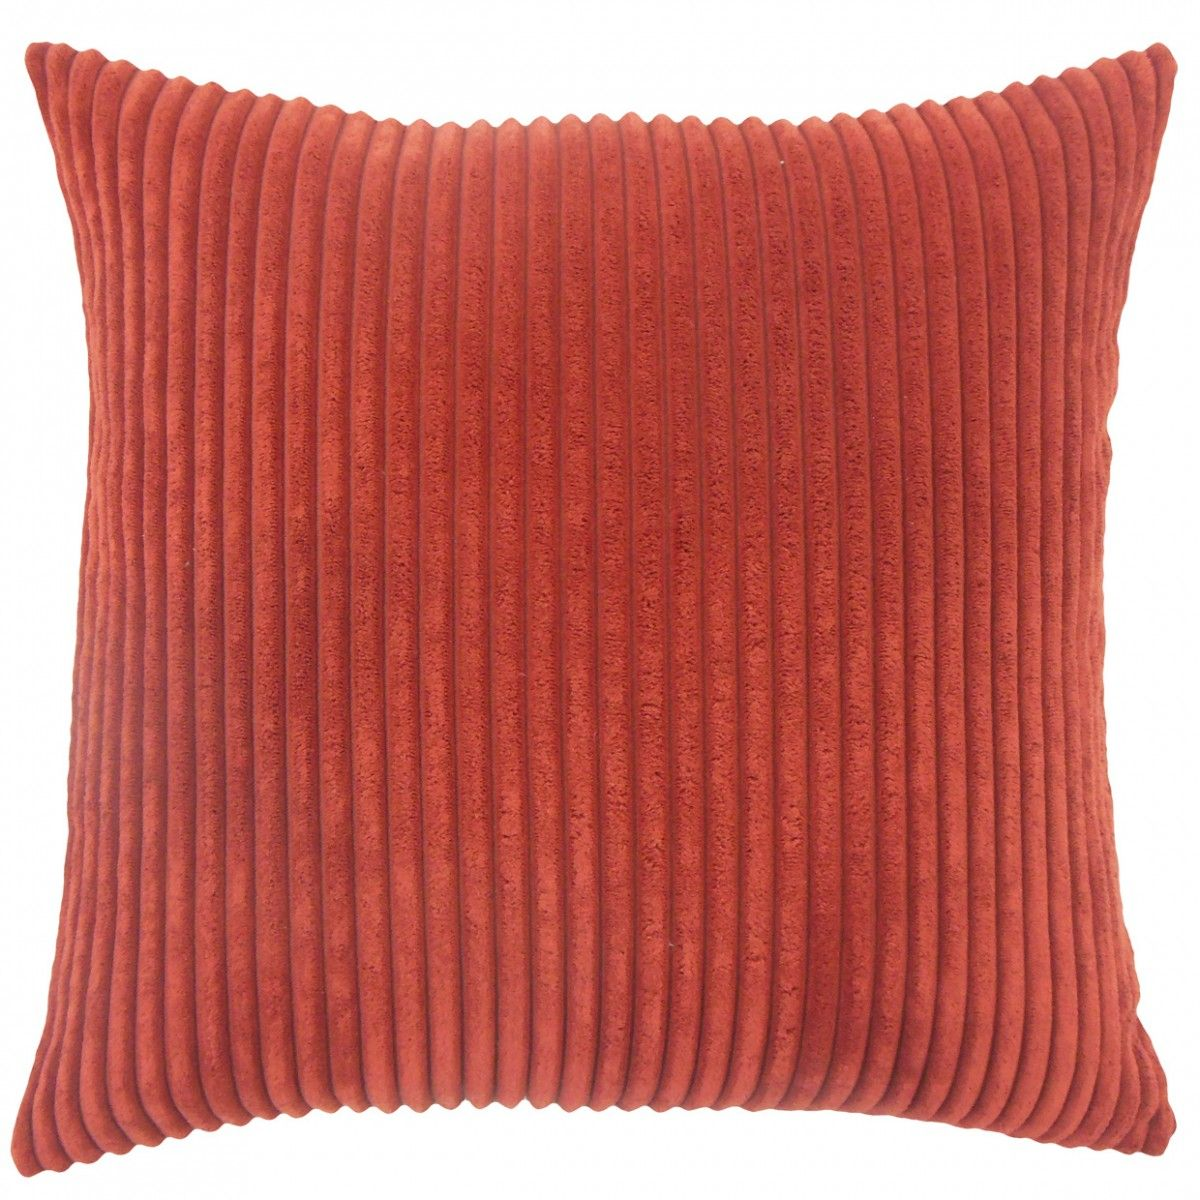 21 Amy Landau Ideas Palm Print Pillow Animal Print Pillows Custom Pillow Covers